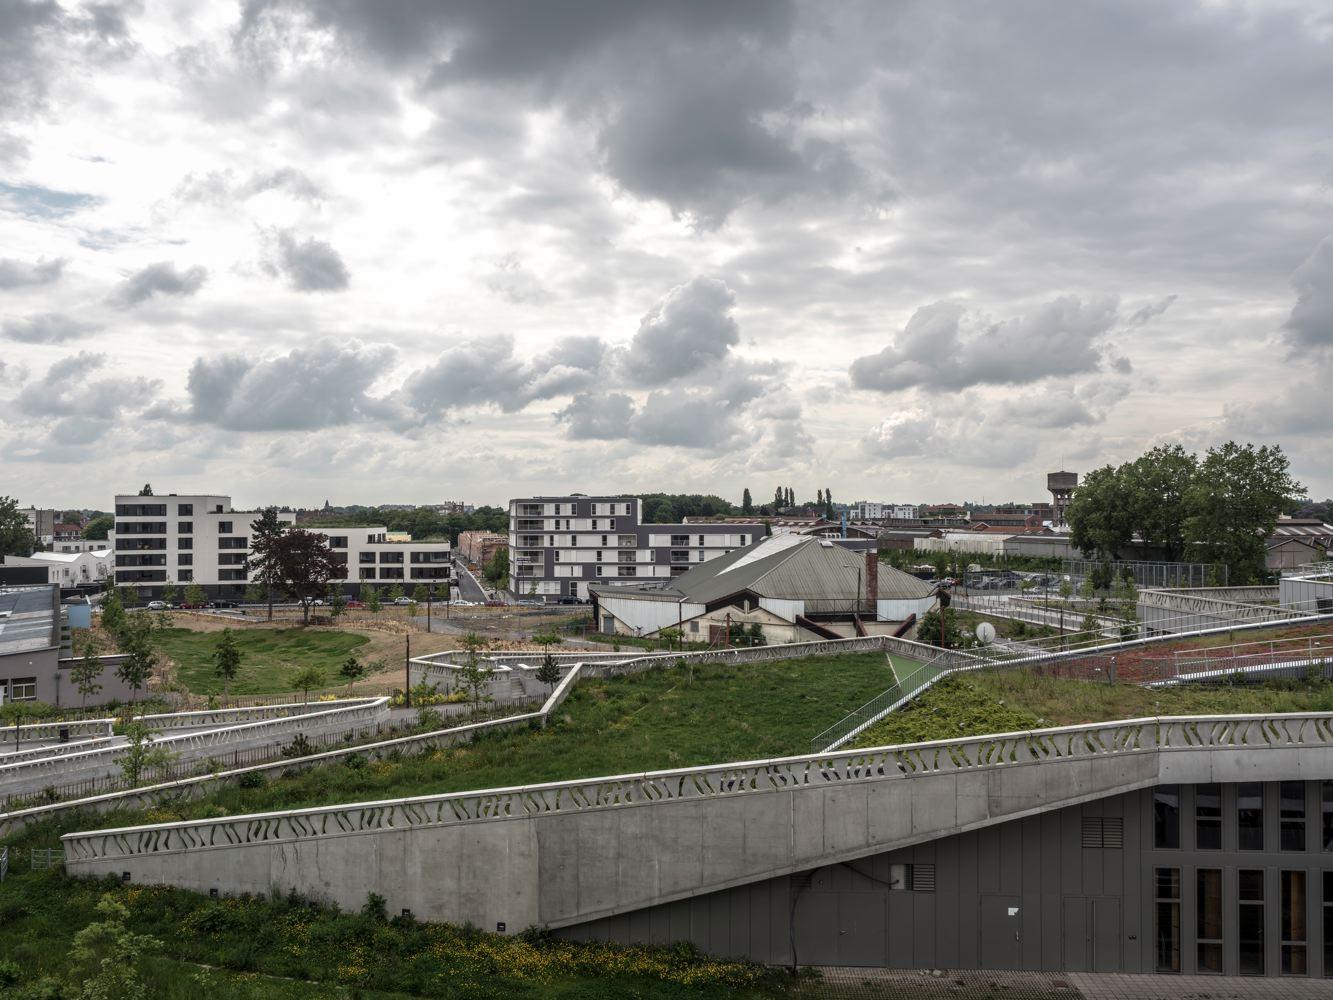 LDKphoto-EFarchi-Lgts_ ZAC_Arras_Europe-Lille SUD-026.jpg